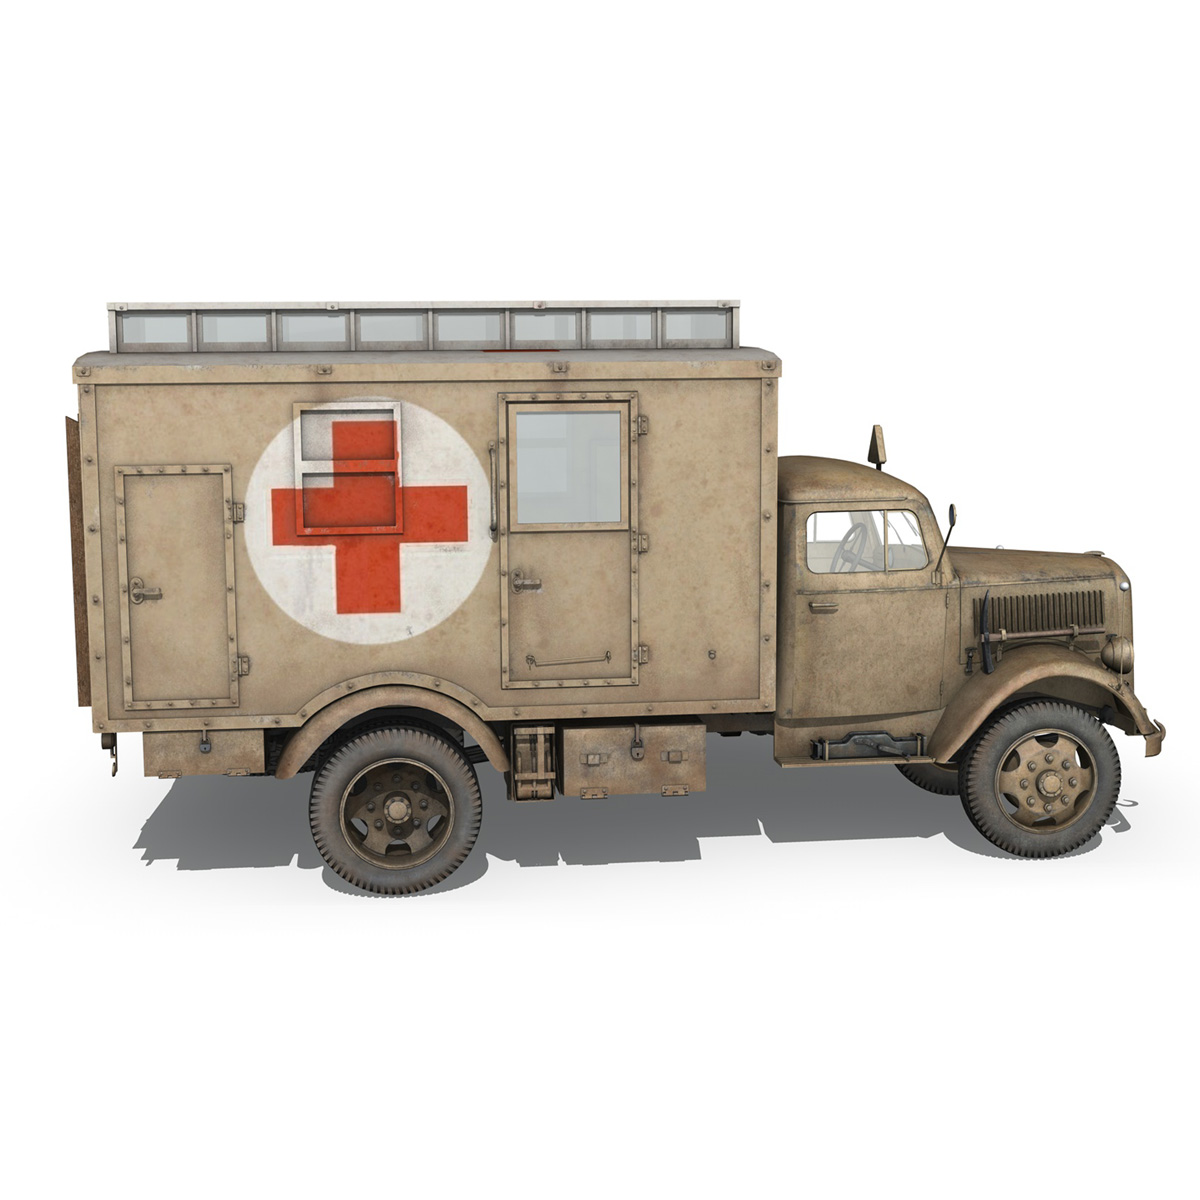 opel blitz – 3t ambulance truck – 2 pzdiv 3d model 3ds c4d fbx lwo lw lws obj 265758